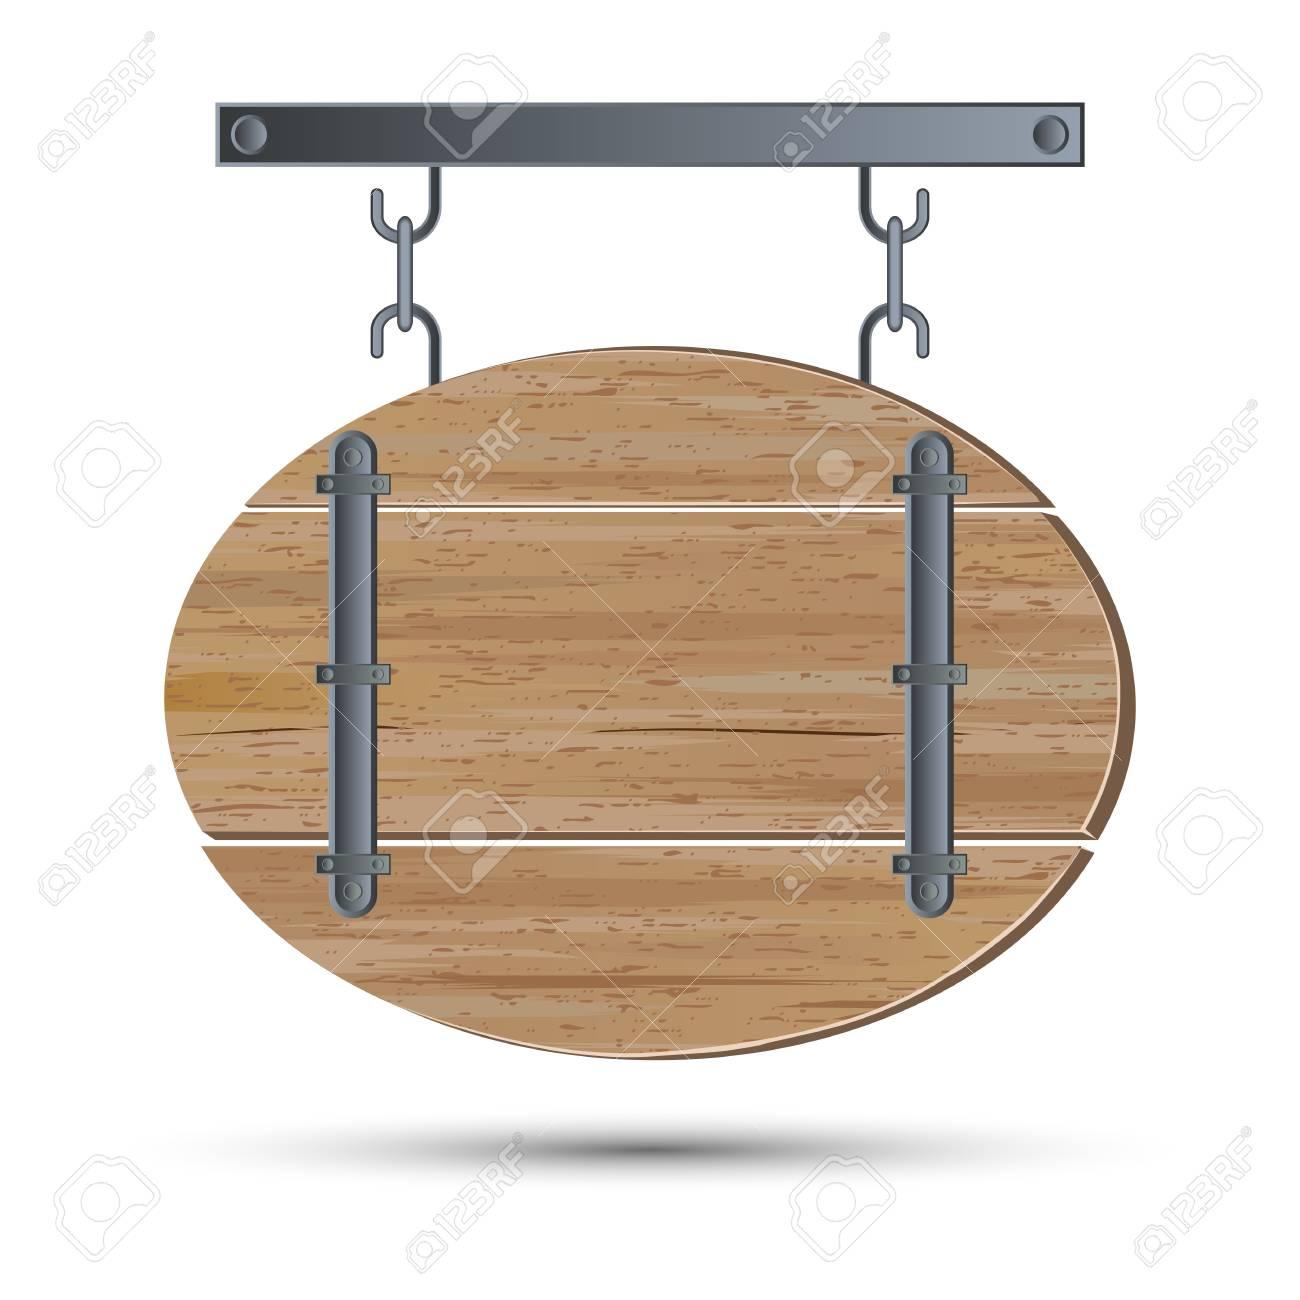 Retro wooden board Stock Vector - 17581192